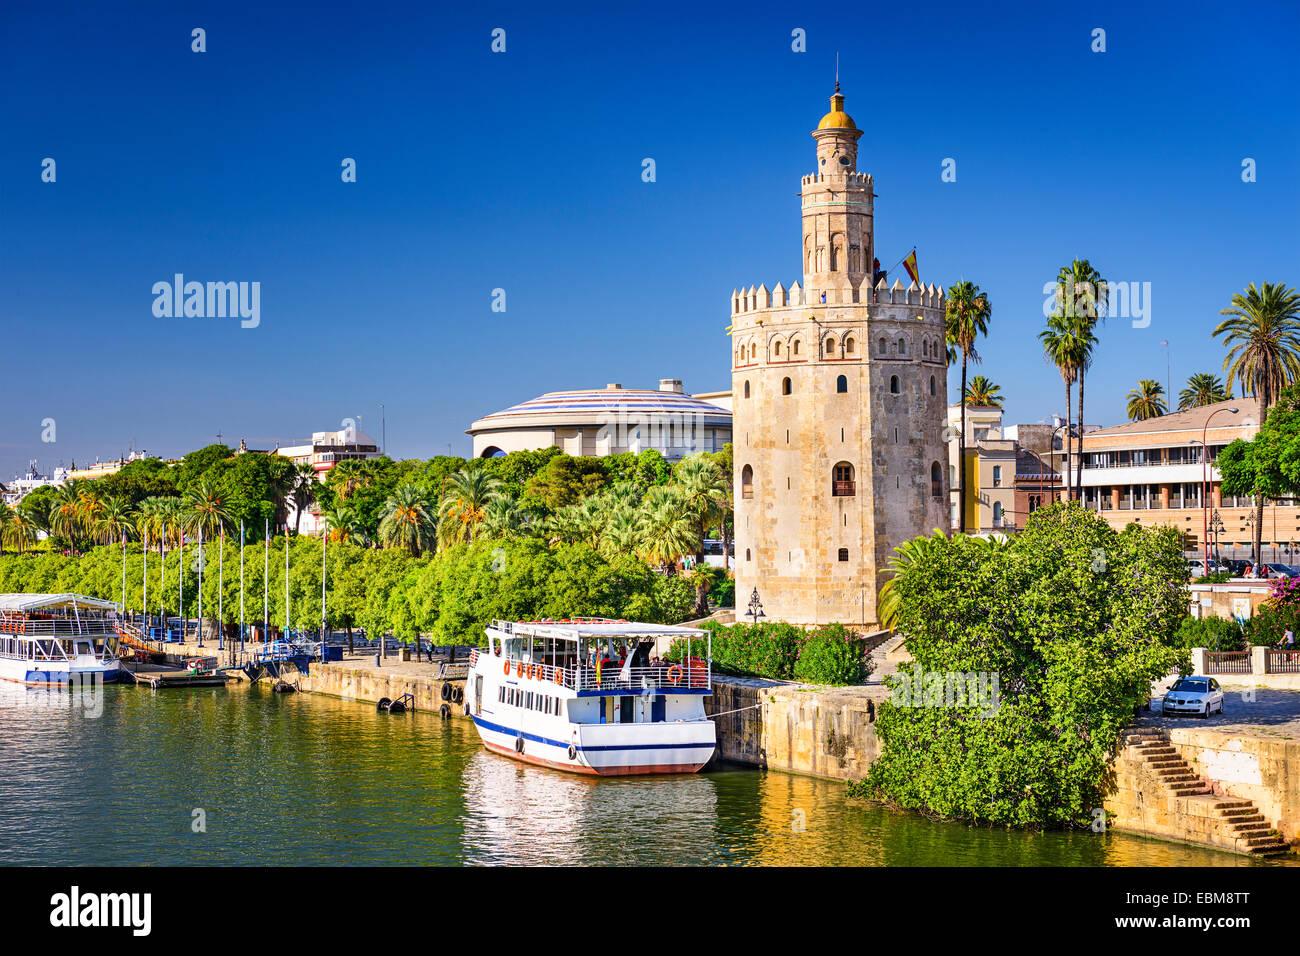 La Torre del Oro à Séville, Espagne. Photo Stock